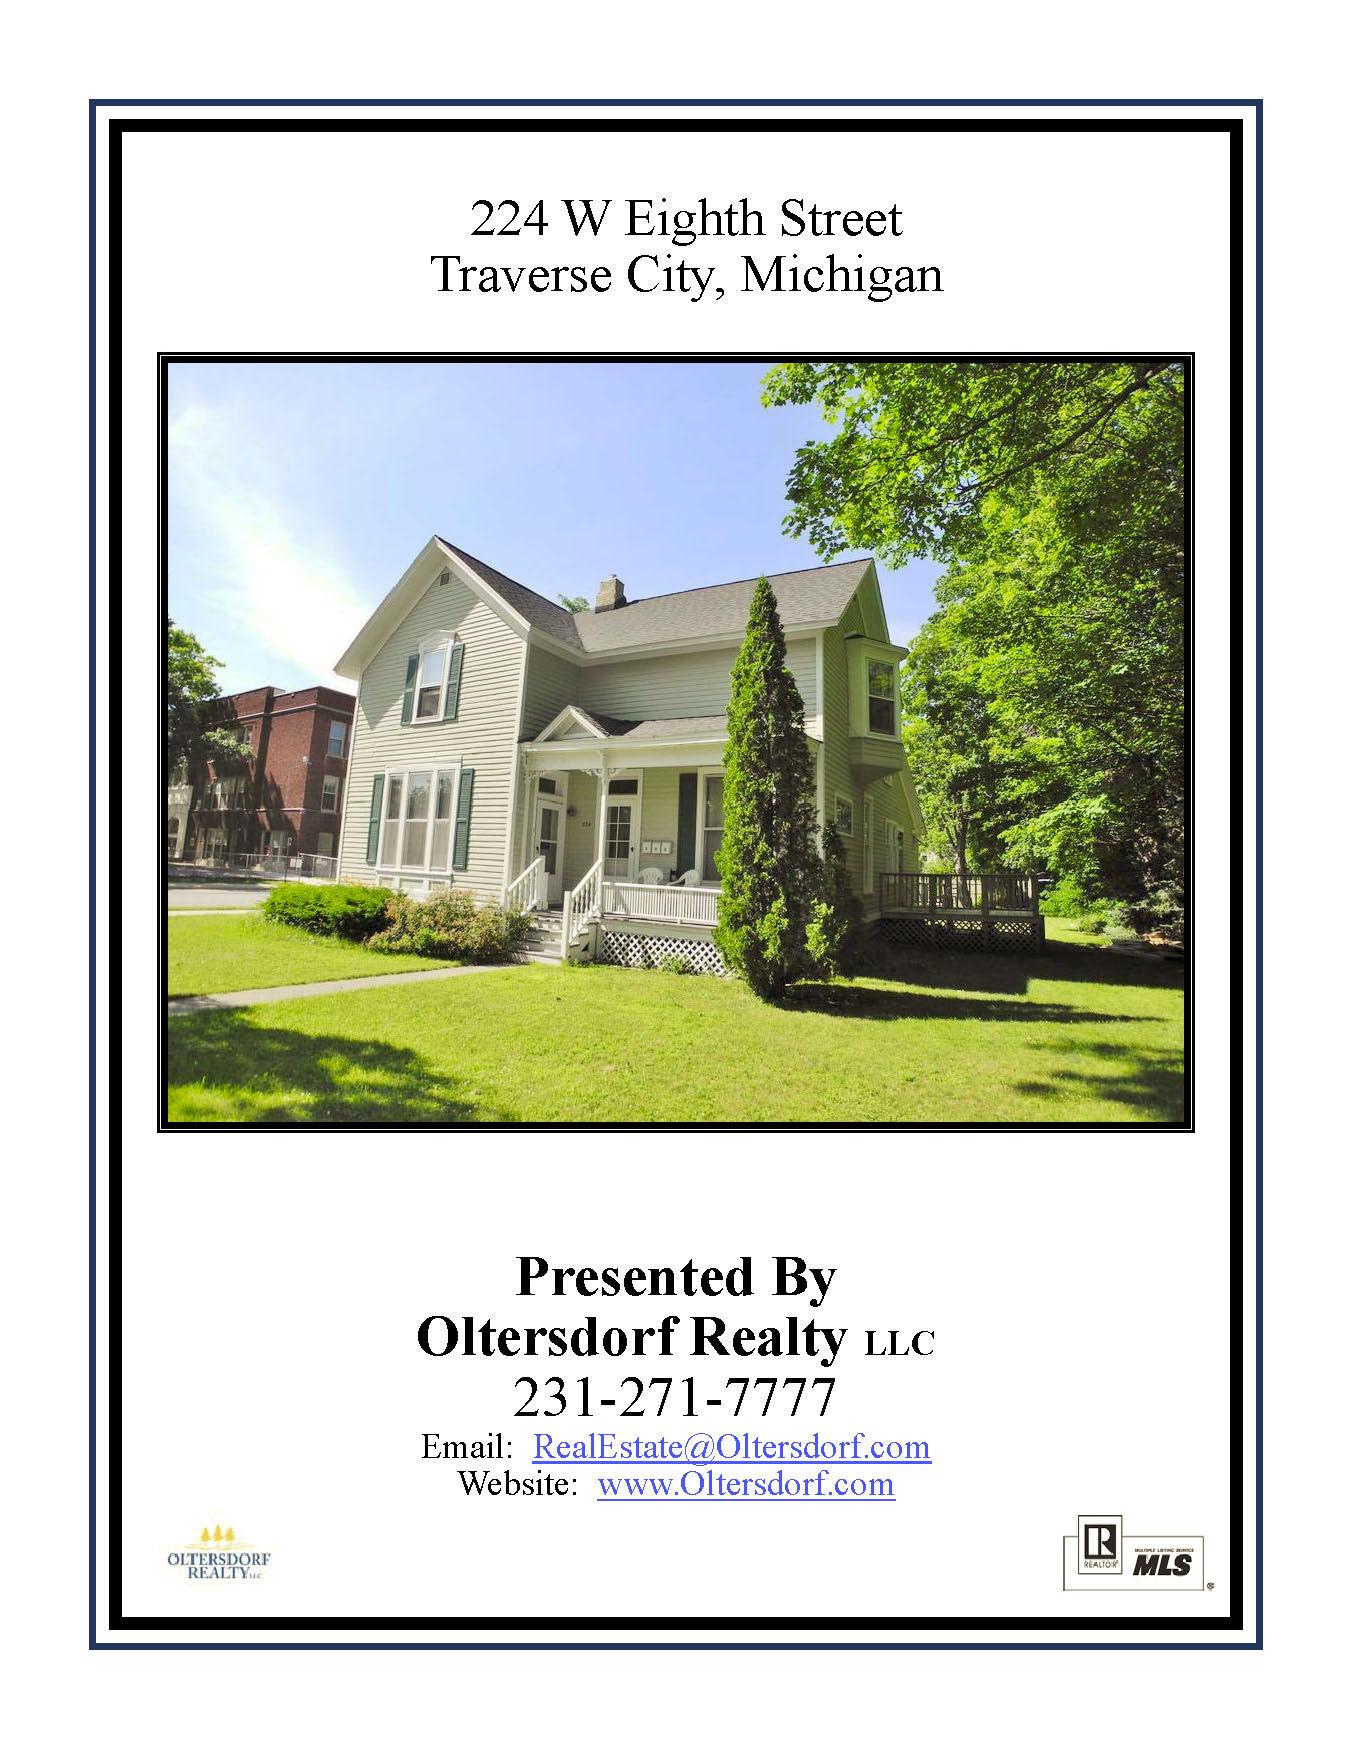 224 W Eighth St, Traverse City, MI – Downtown Traverse City Triplex Marketing Packet - For sale by Oltersdorf Realty LLC (1).jpg